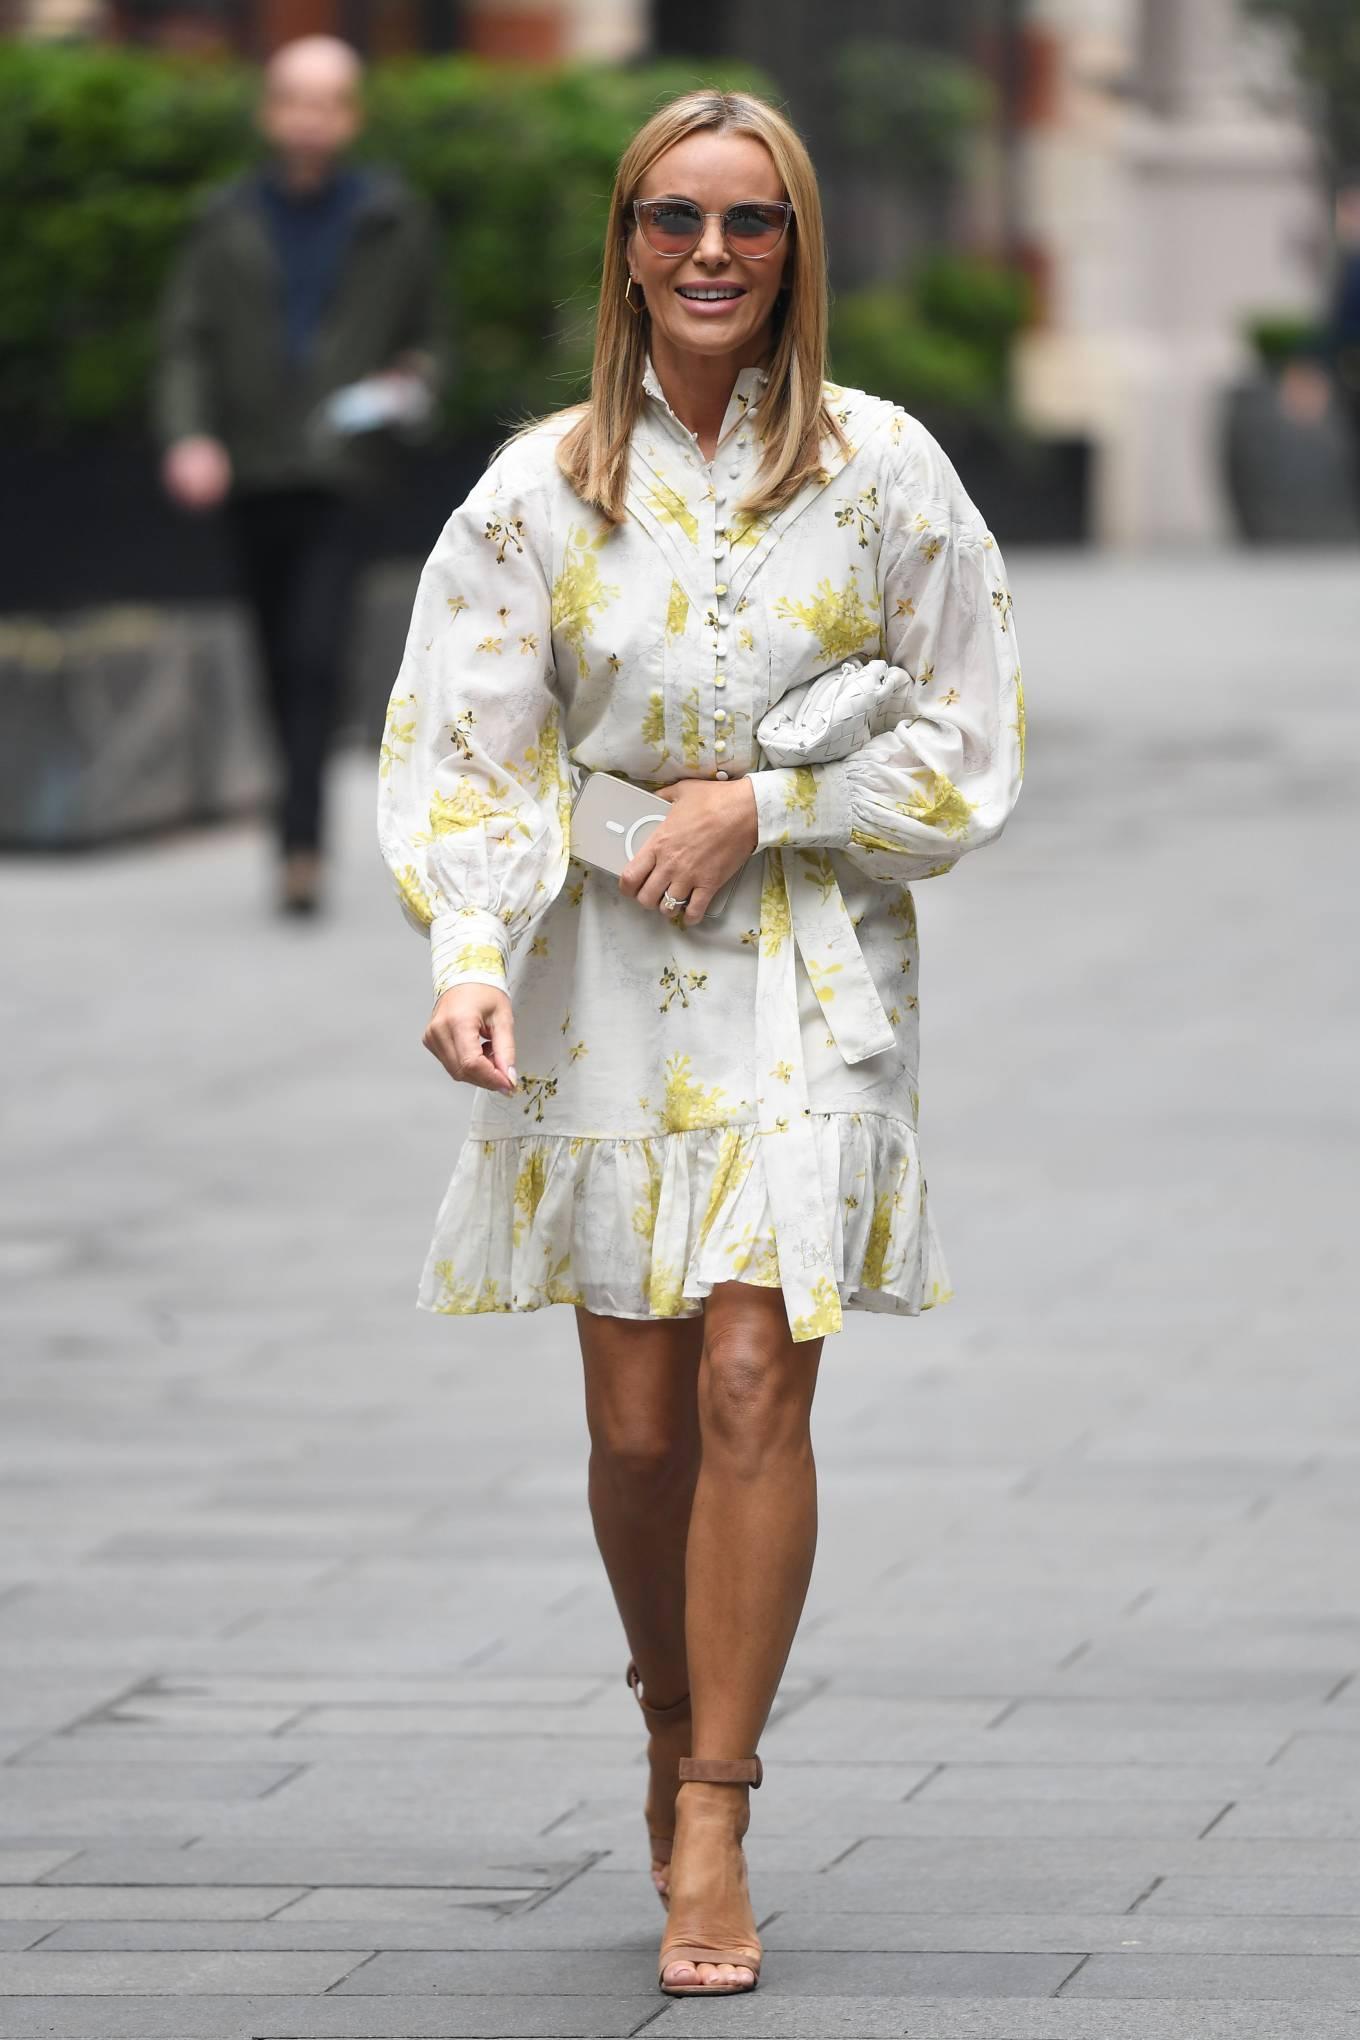 Amanda Holden - In floral mini dress at Global Radio in London